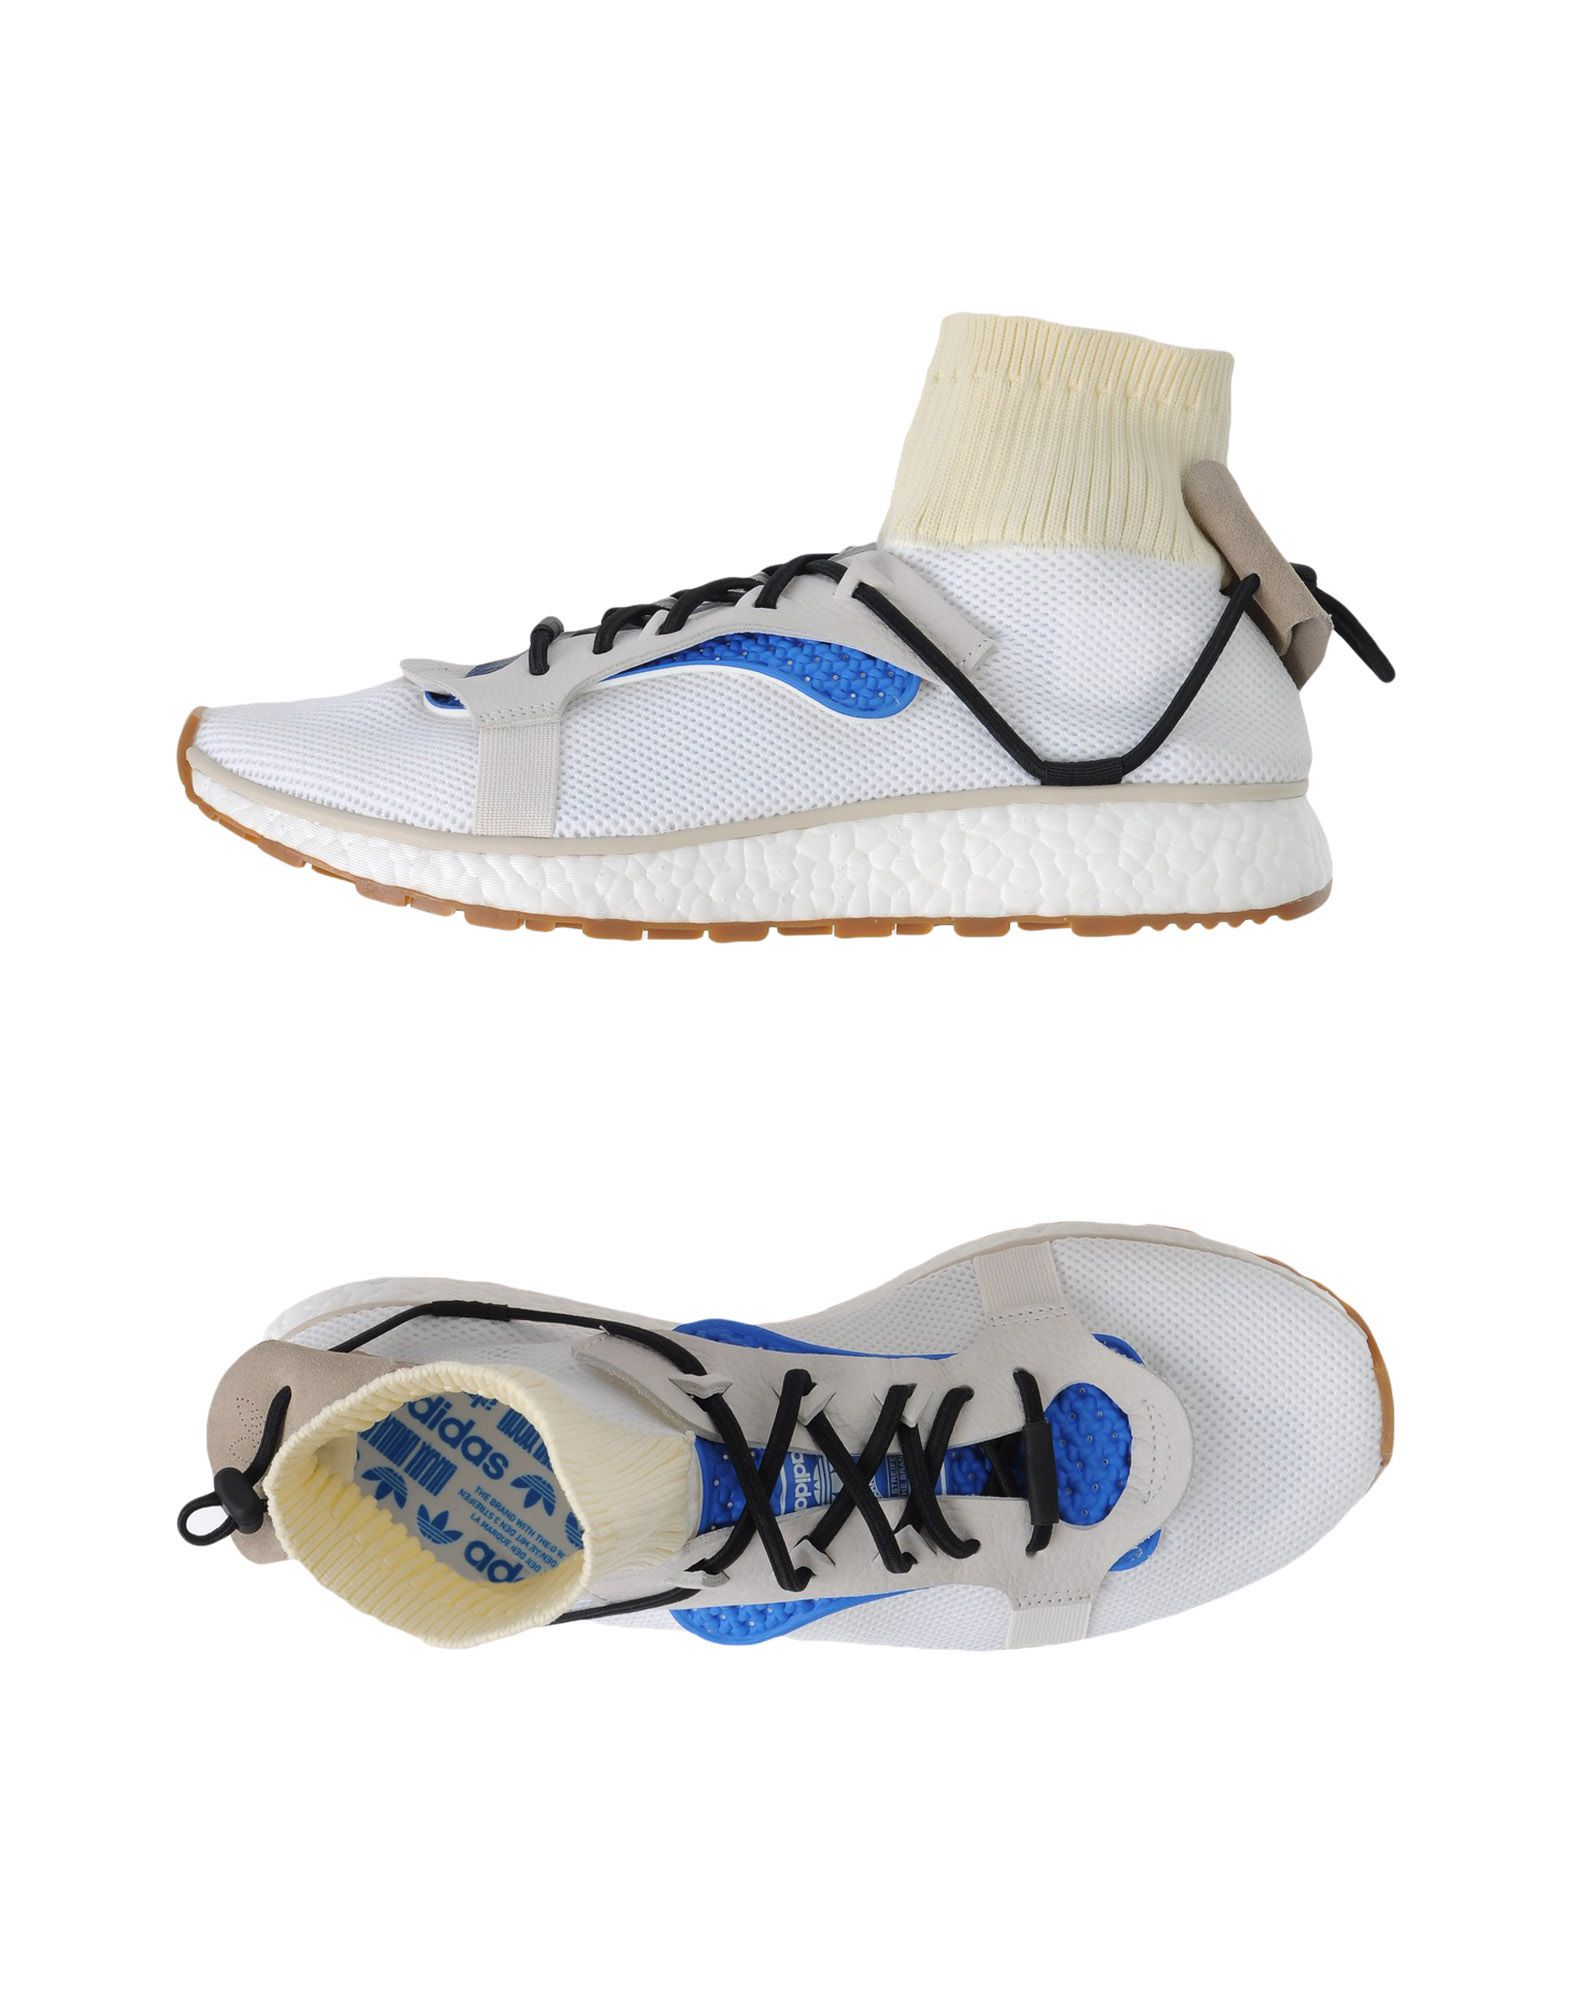 846c3317b56 ADIDAS ORIGINALS ΠΑΠΟΥΤΣΙΑ Χαμηλά sneakers, Ανδρικά sneakers, ΑΝΔΡΑΣ ...